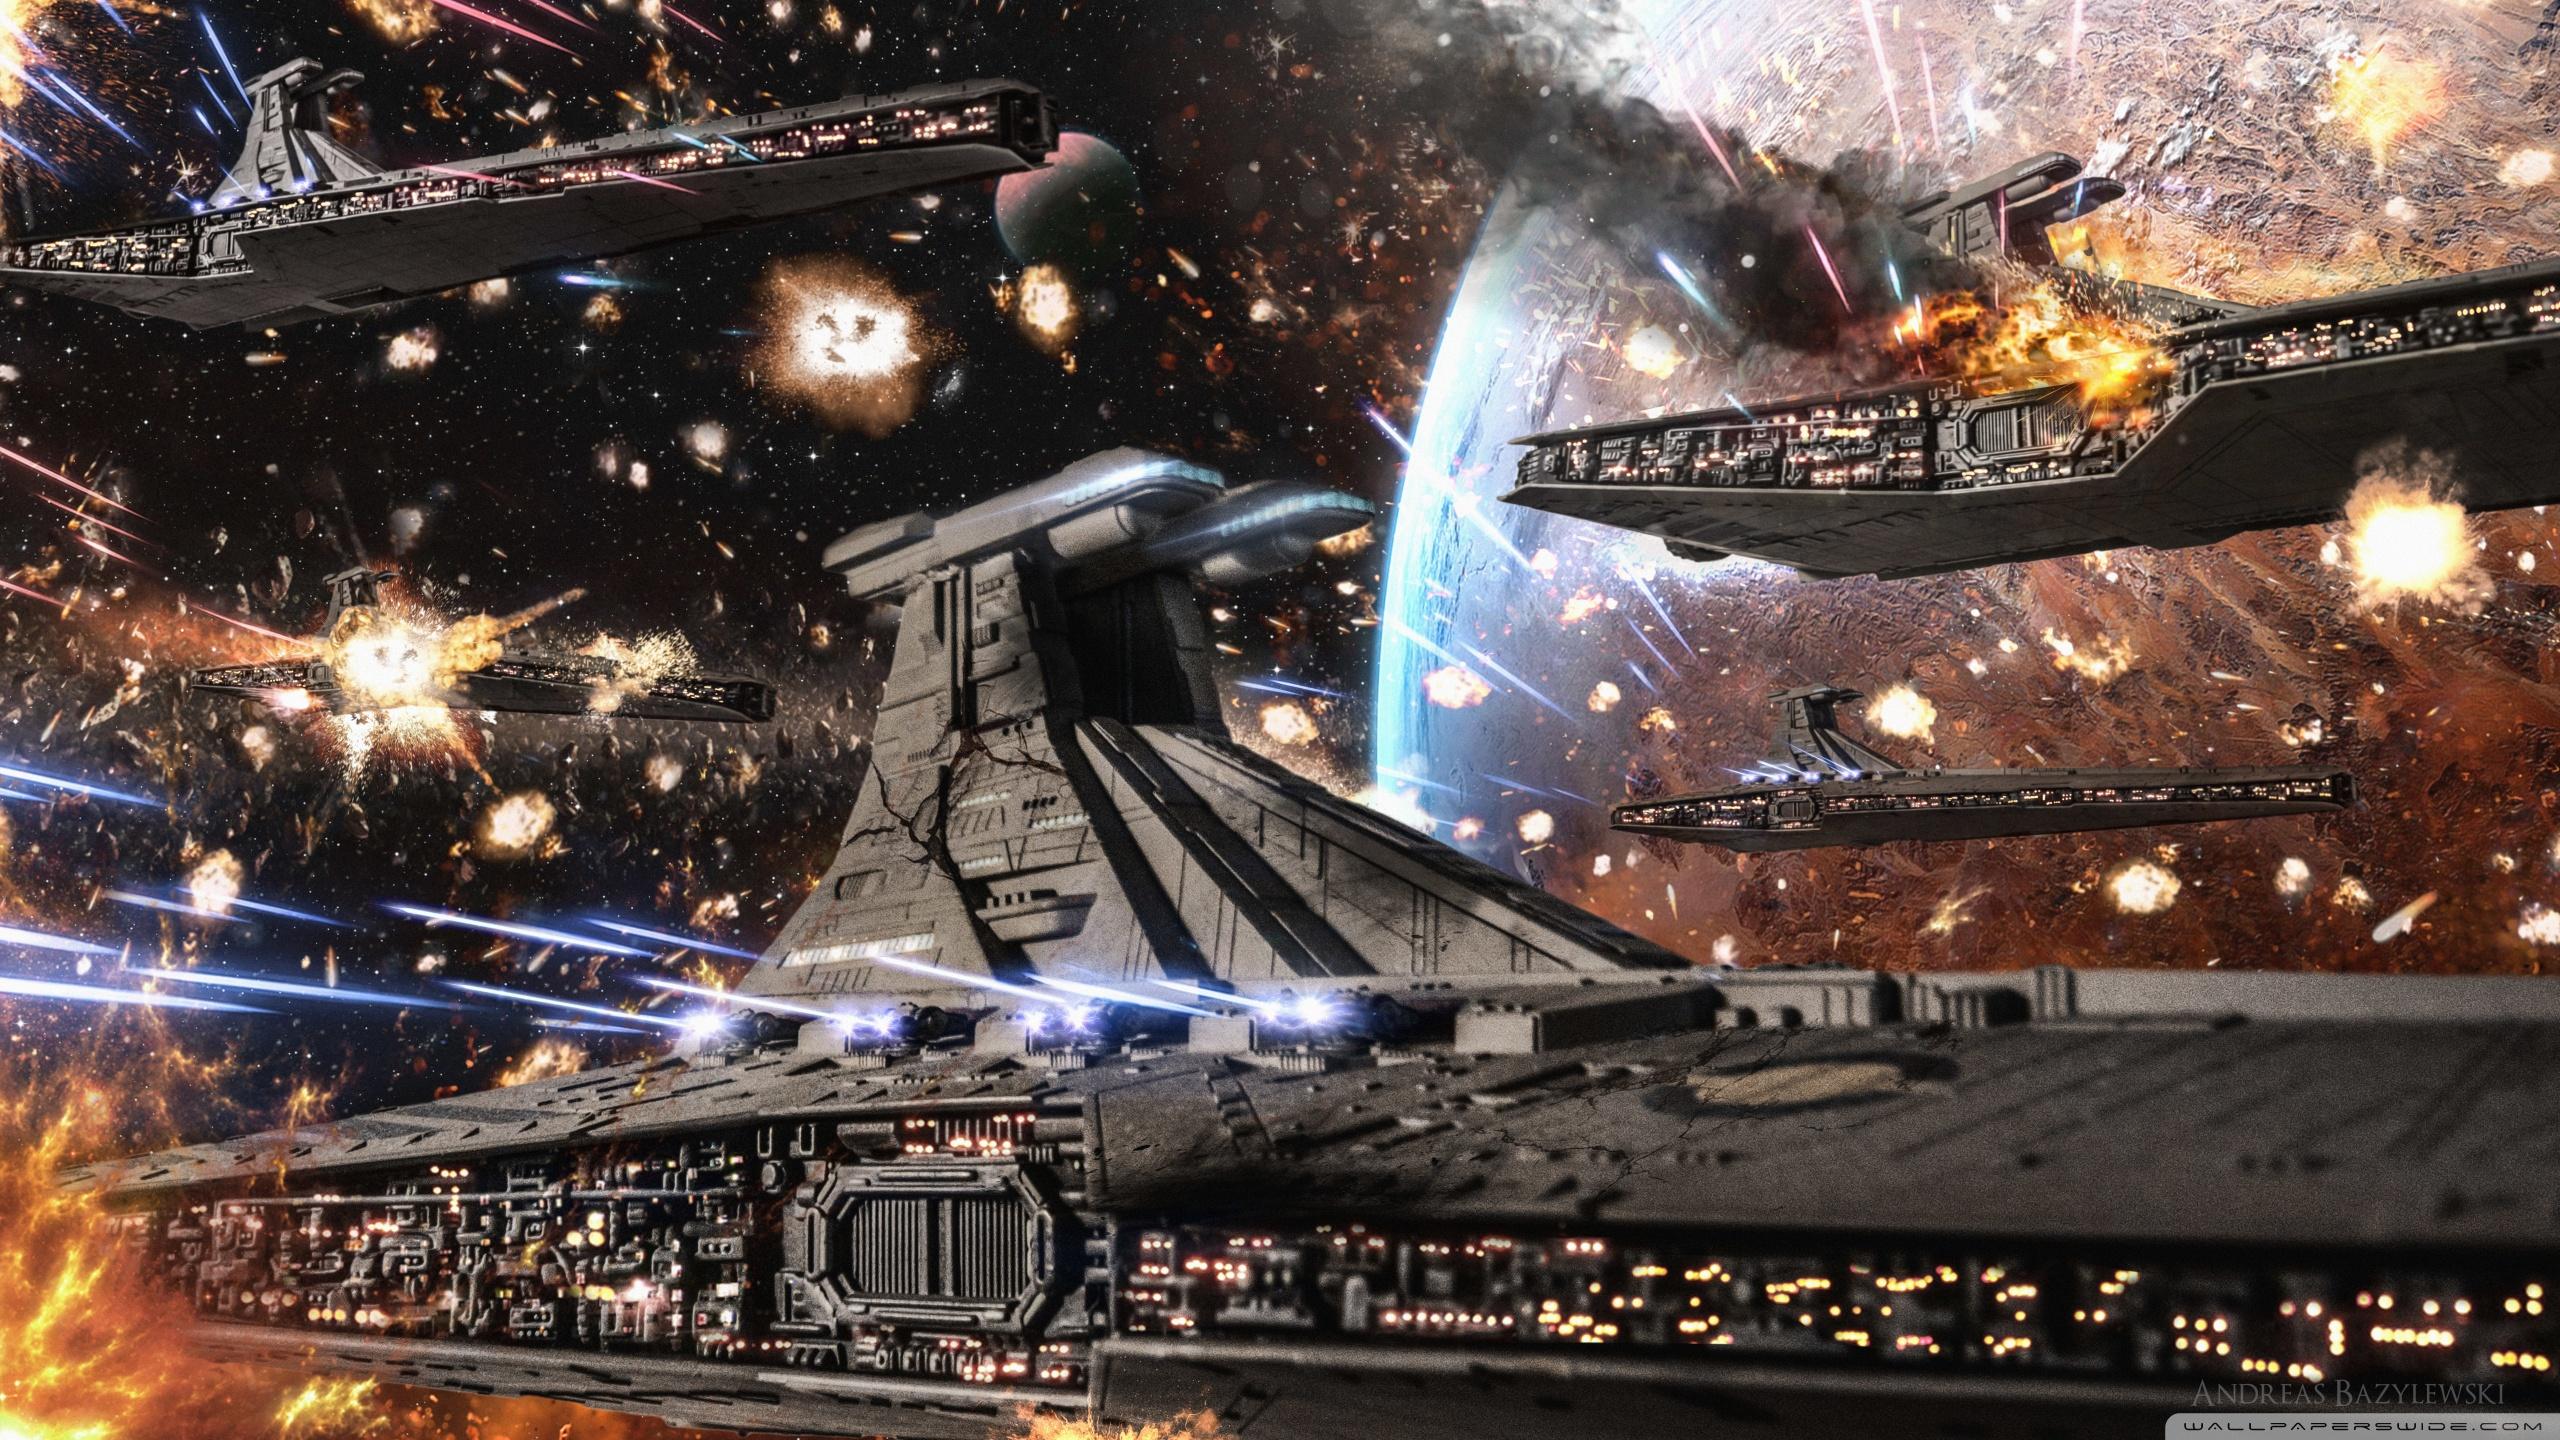 Hd 16 Star Wars Clone Wars 82912 Hd Wallpaper Backgrounds Download